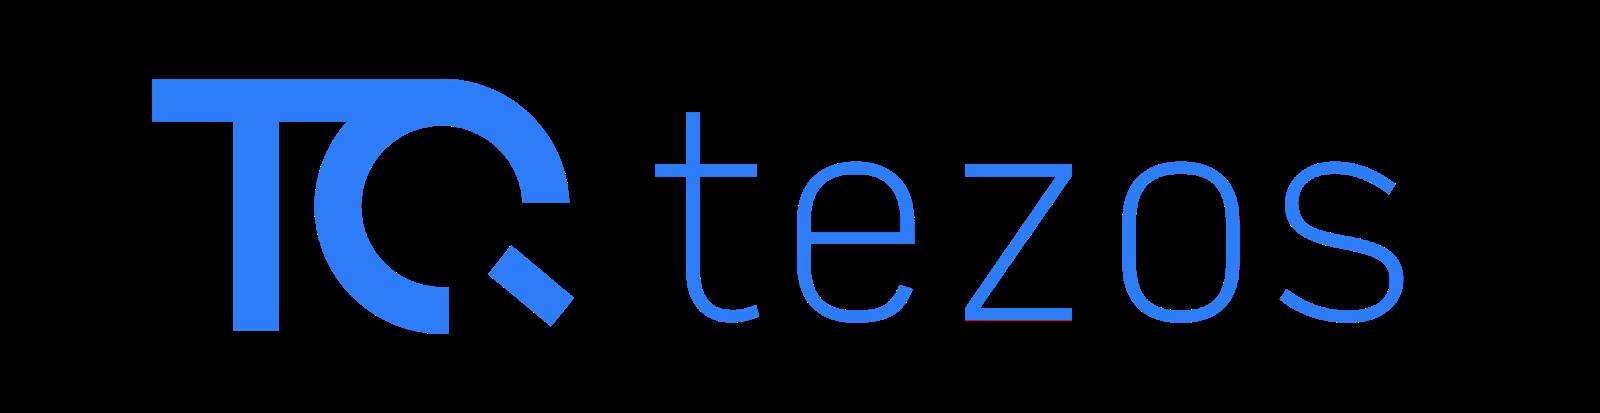 TQ Tezos logo